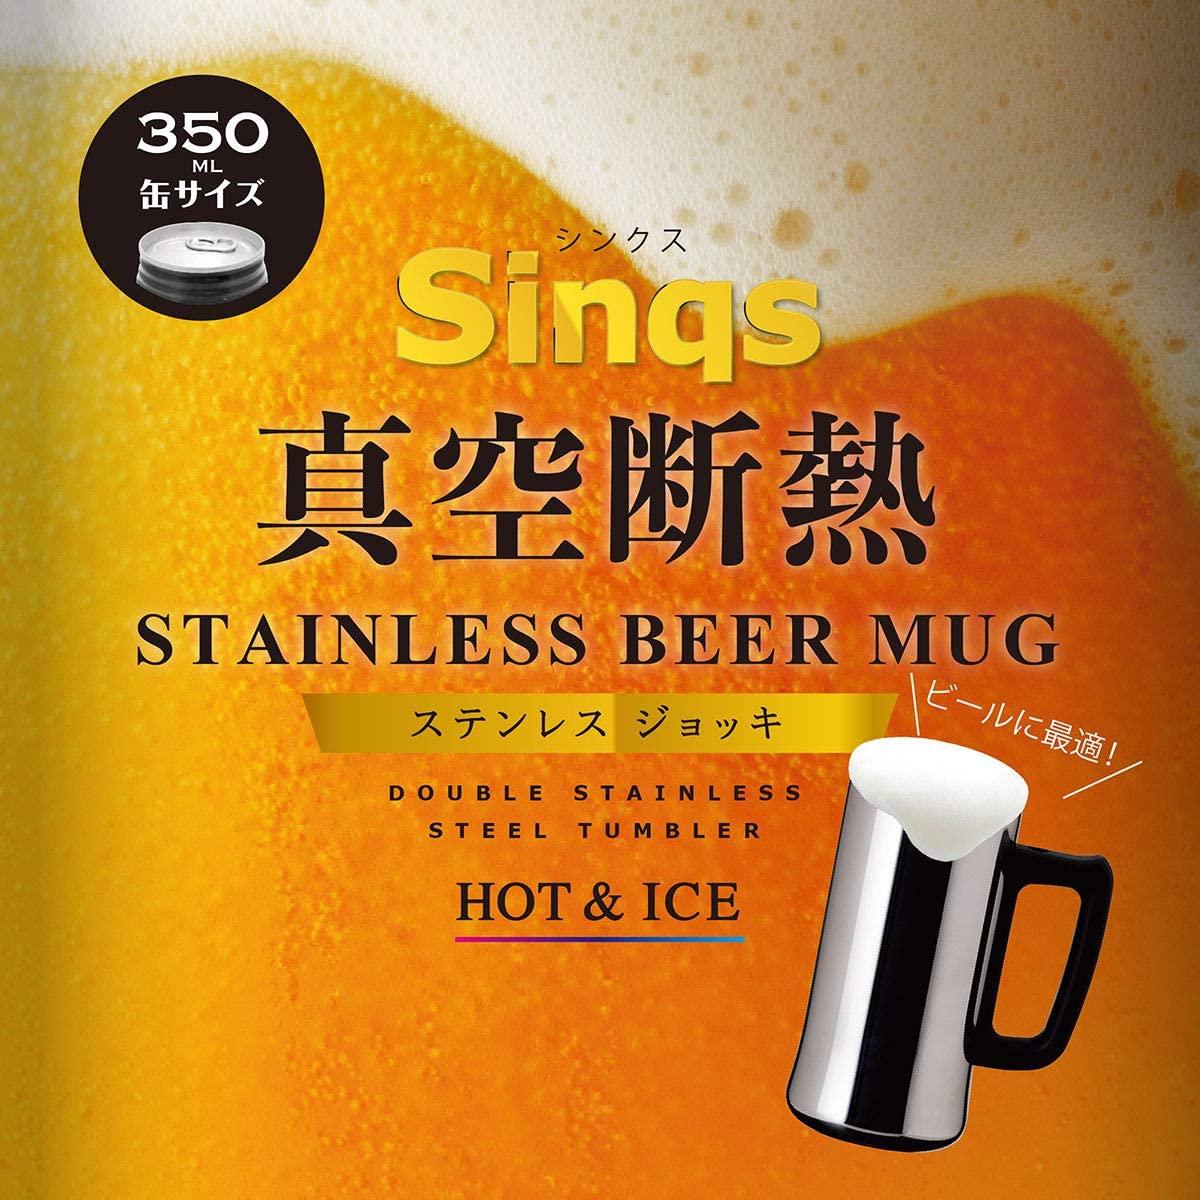 Atlas(アトラス) Sinqs 真空ビールジョッキ 470ml ASJ-472MRの商品画像6